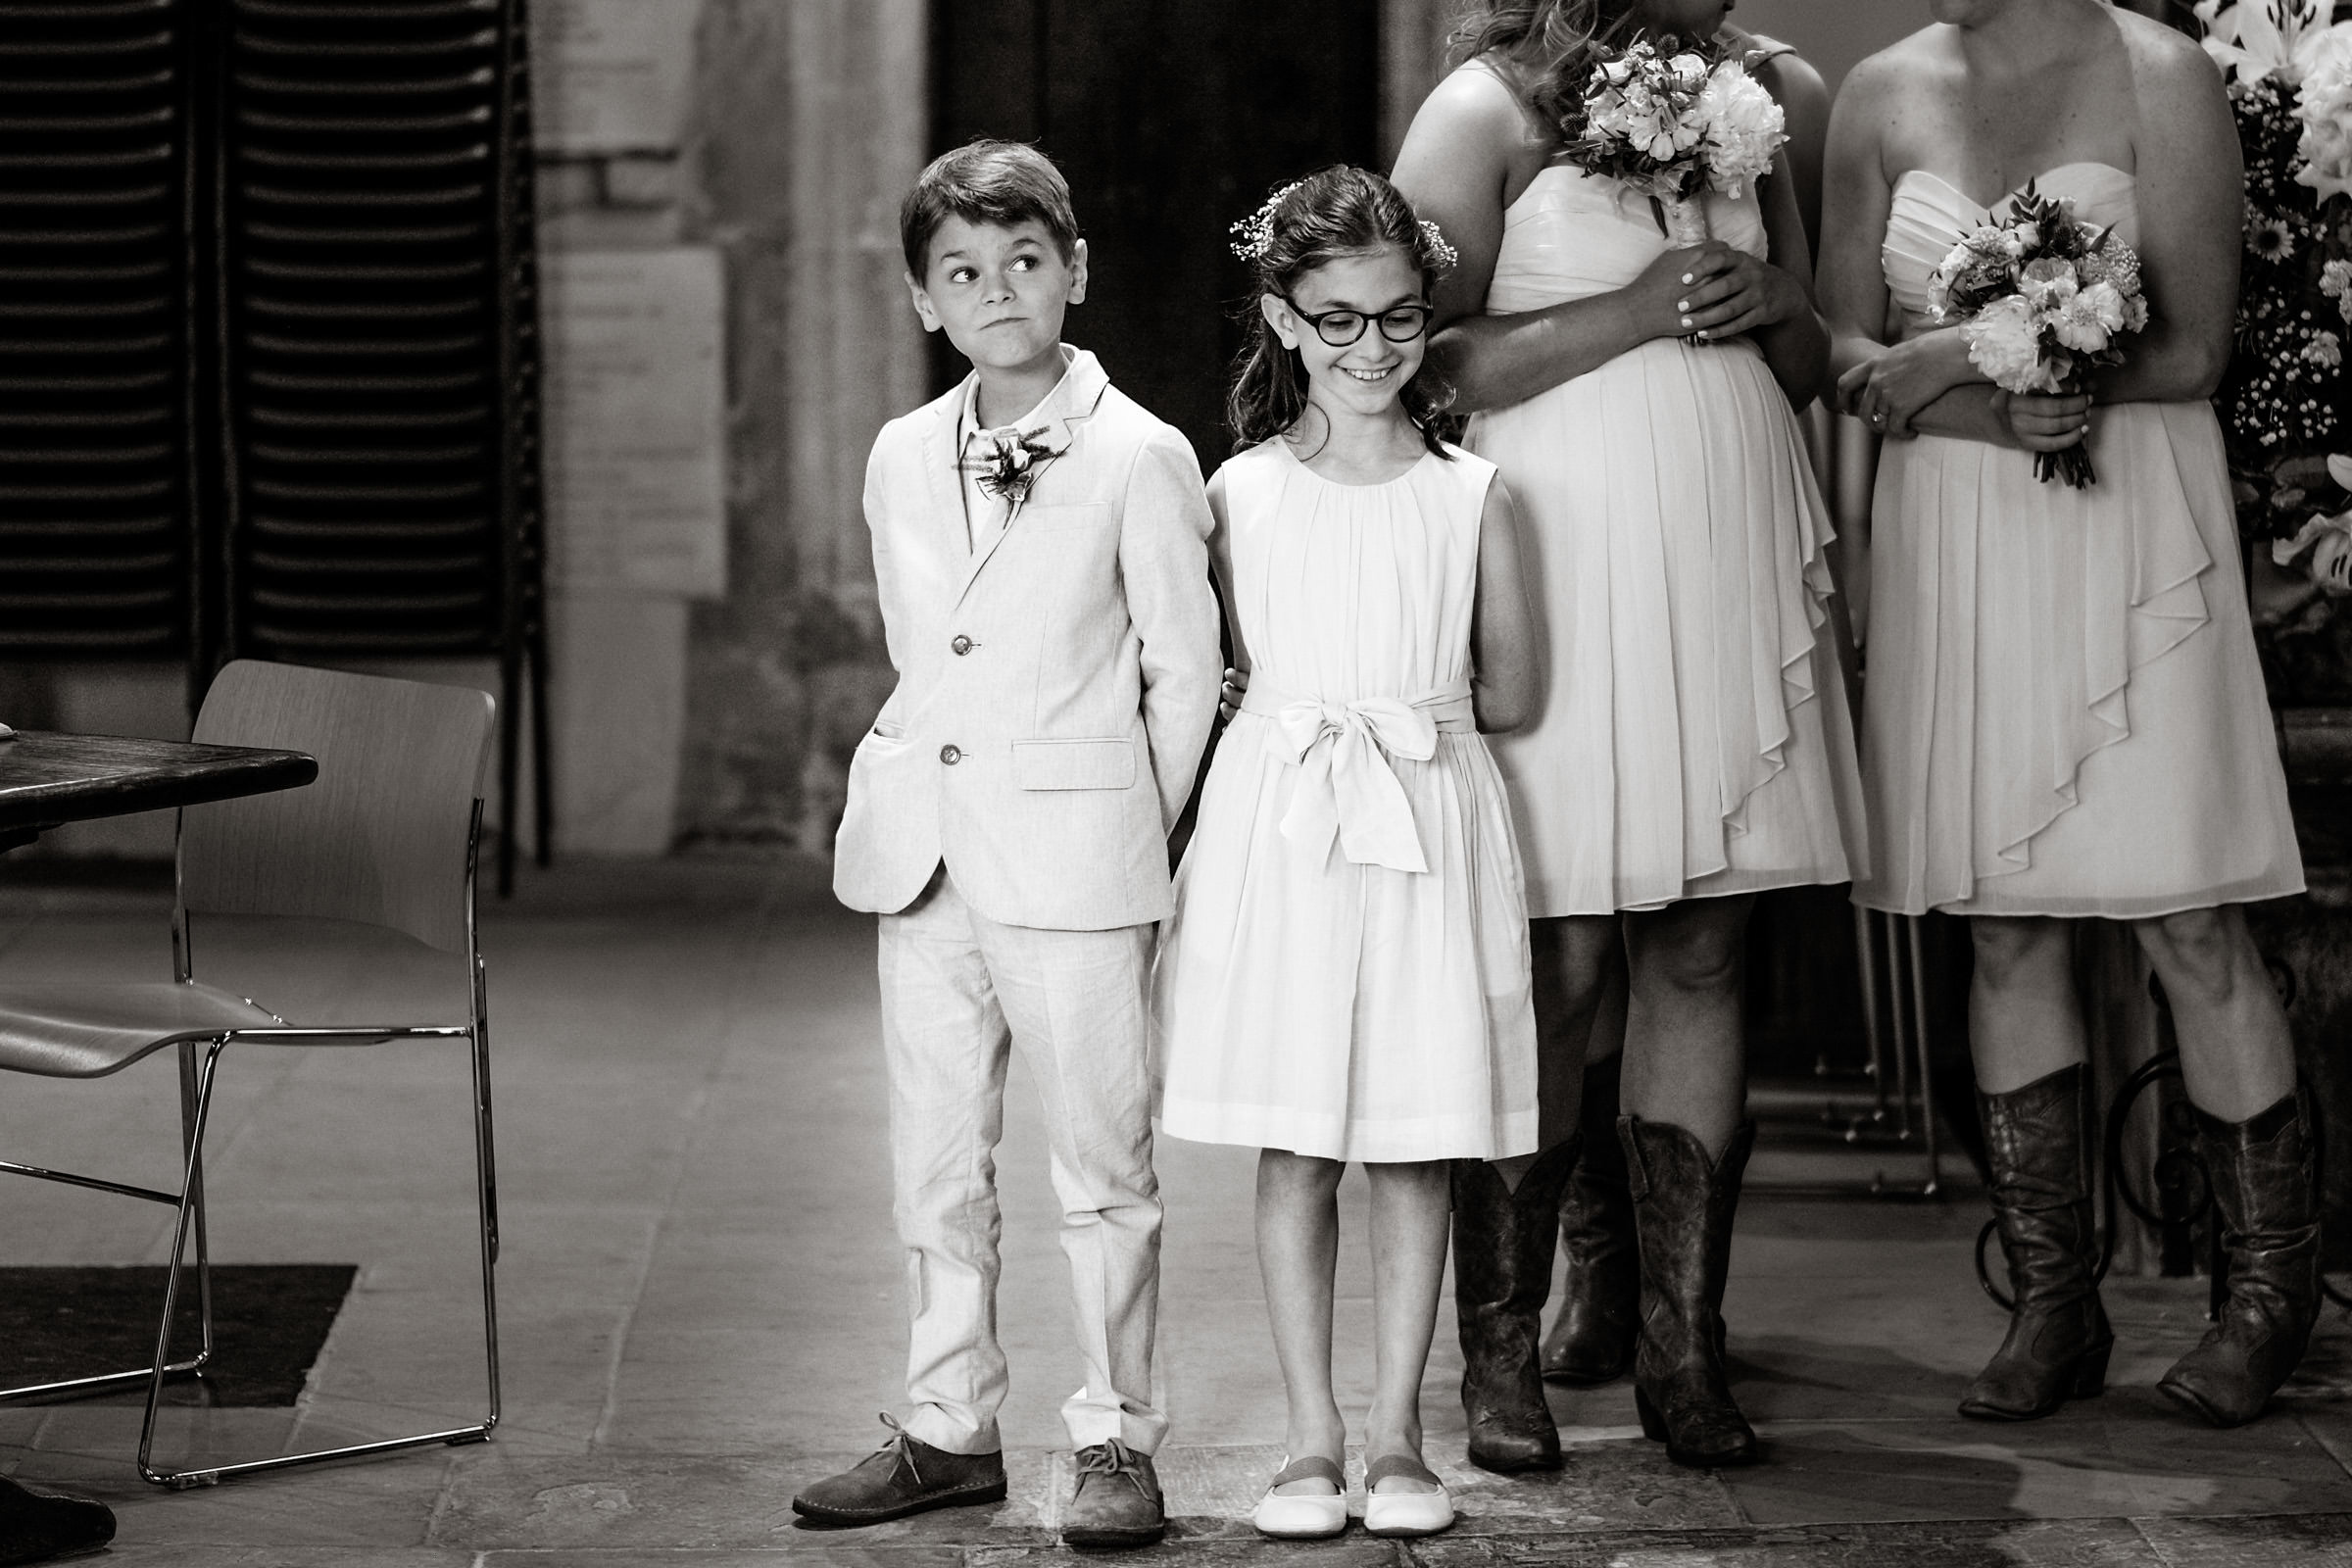 Wedding+at+St.+Mary's+Church+in+Surrey+012.jpg